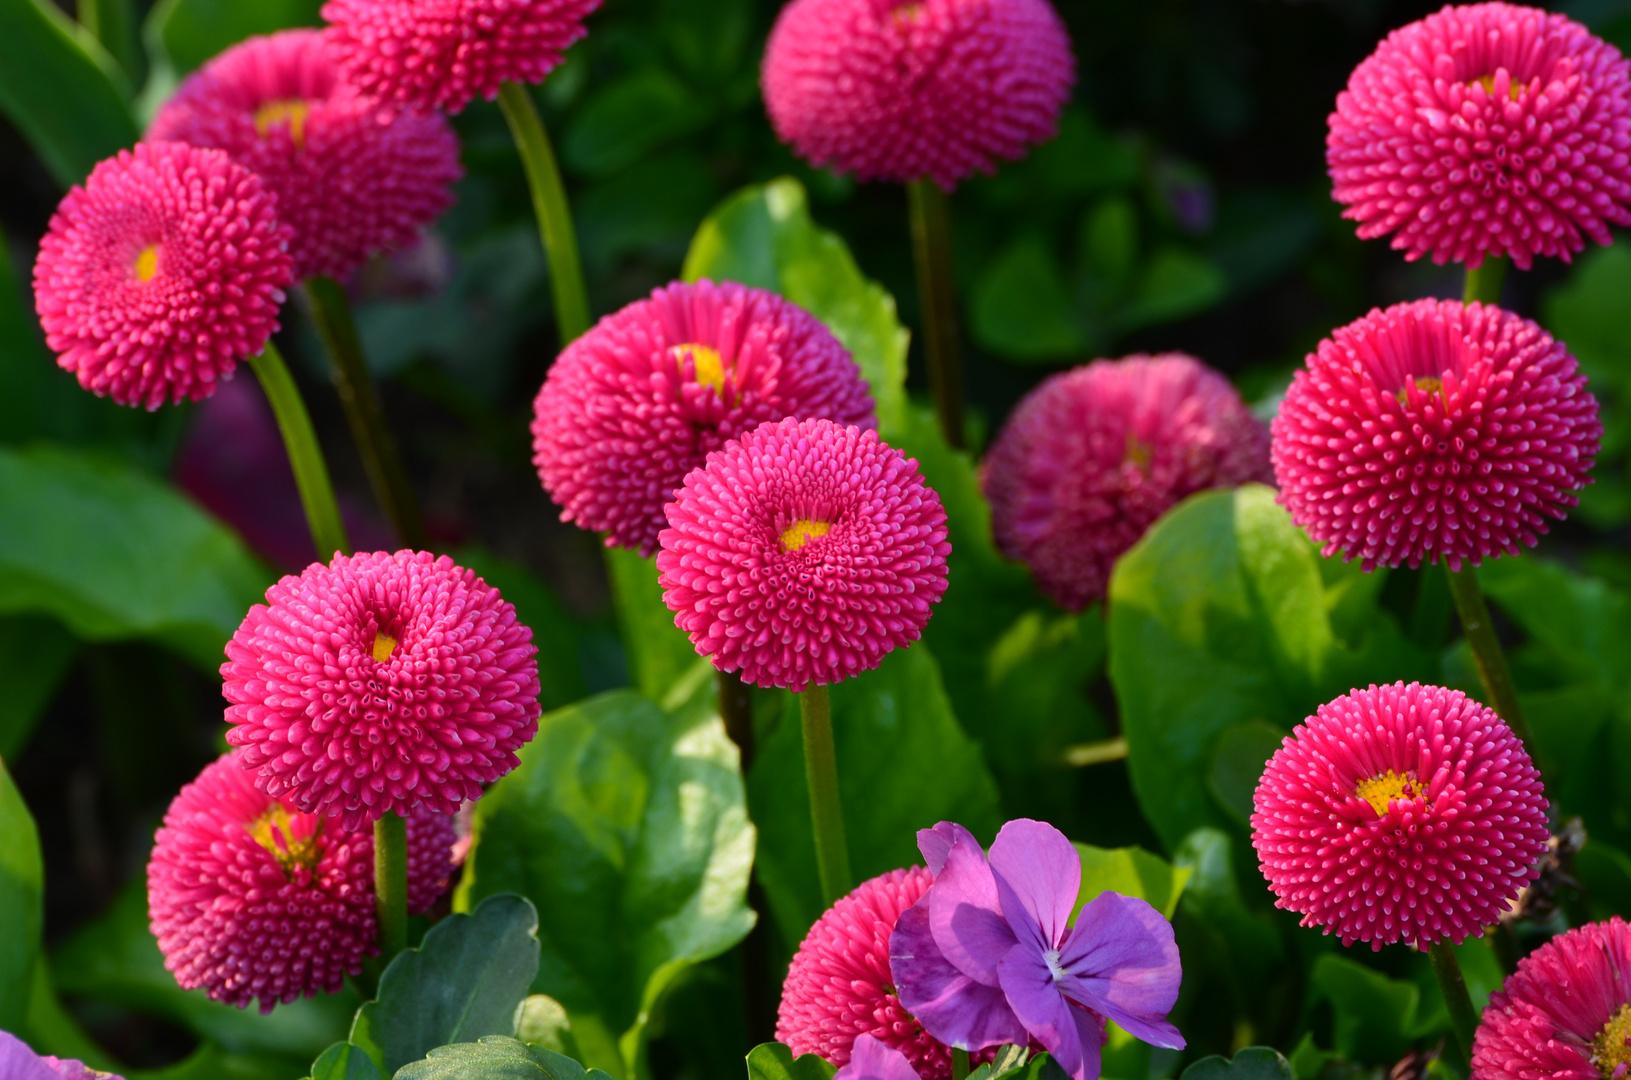 sommerblumen foto & bild | pflanzen, pilze & flechten, blüten